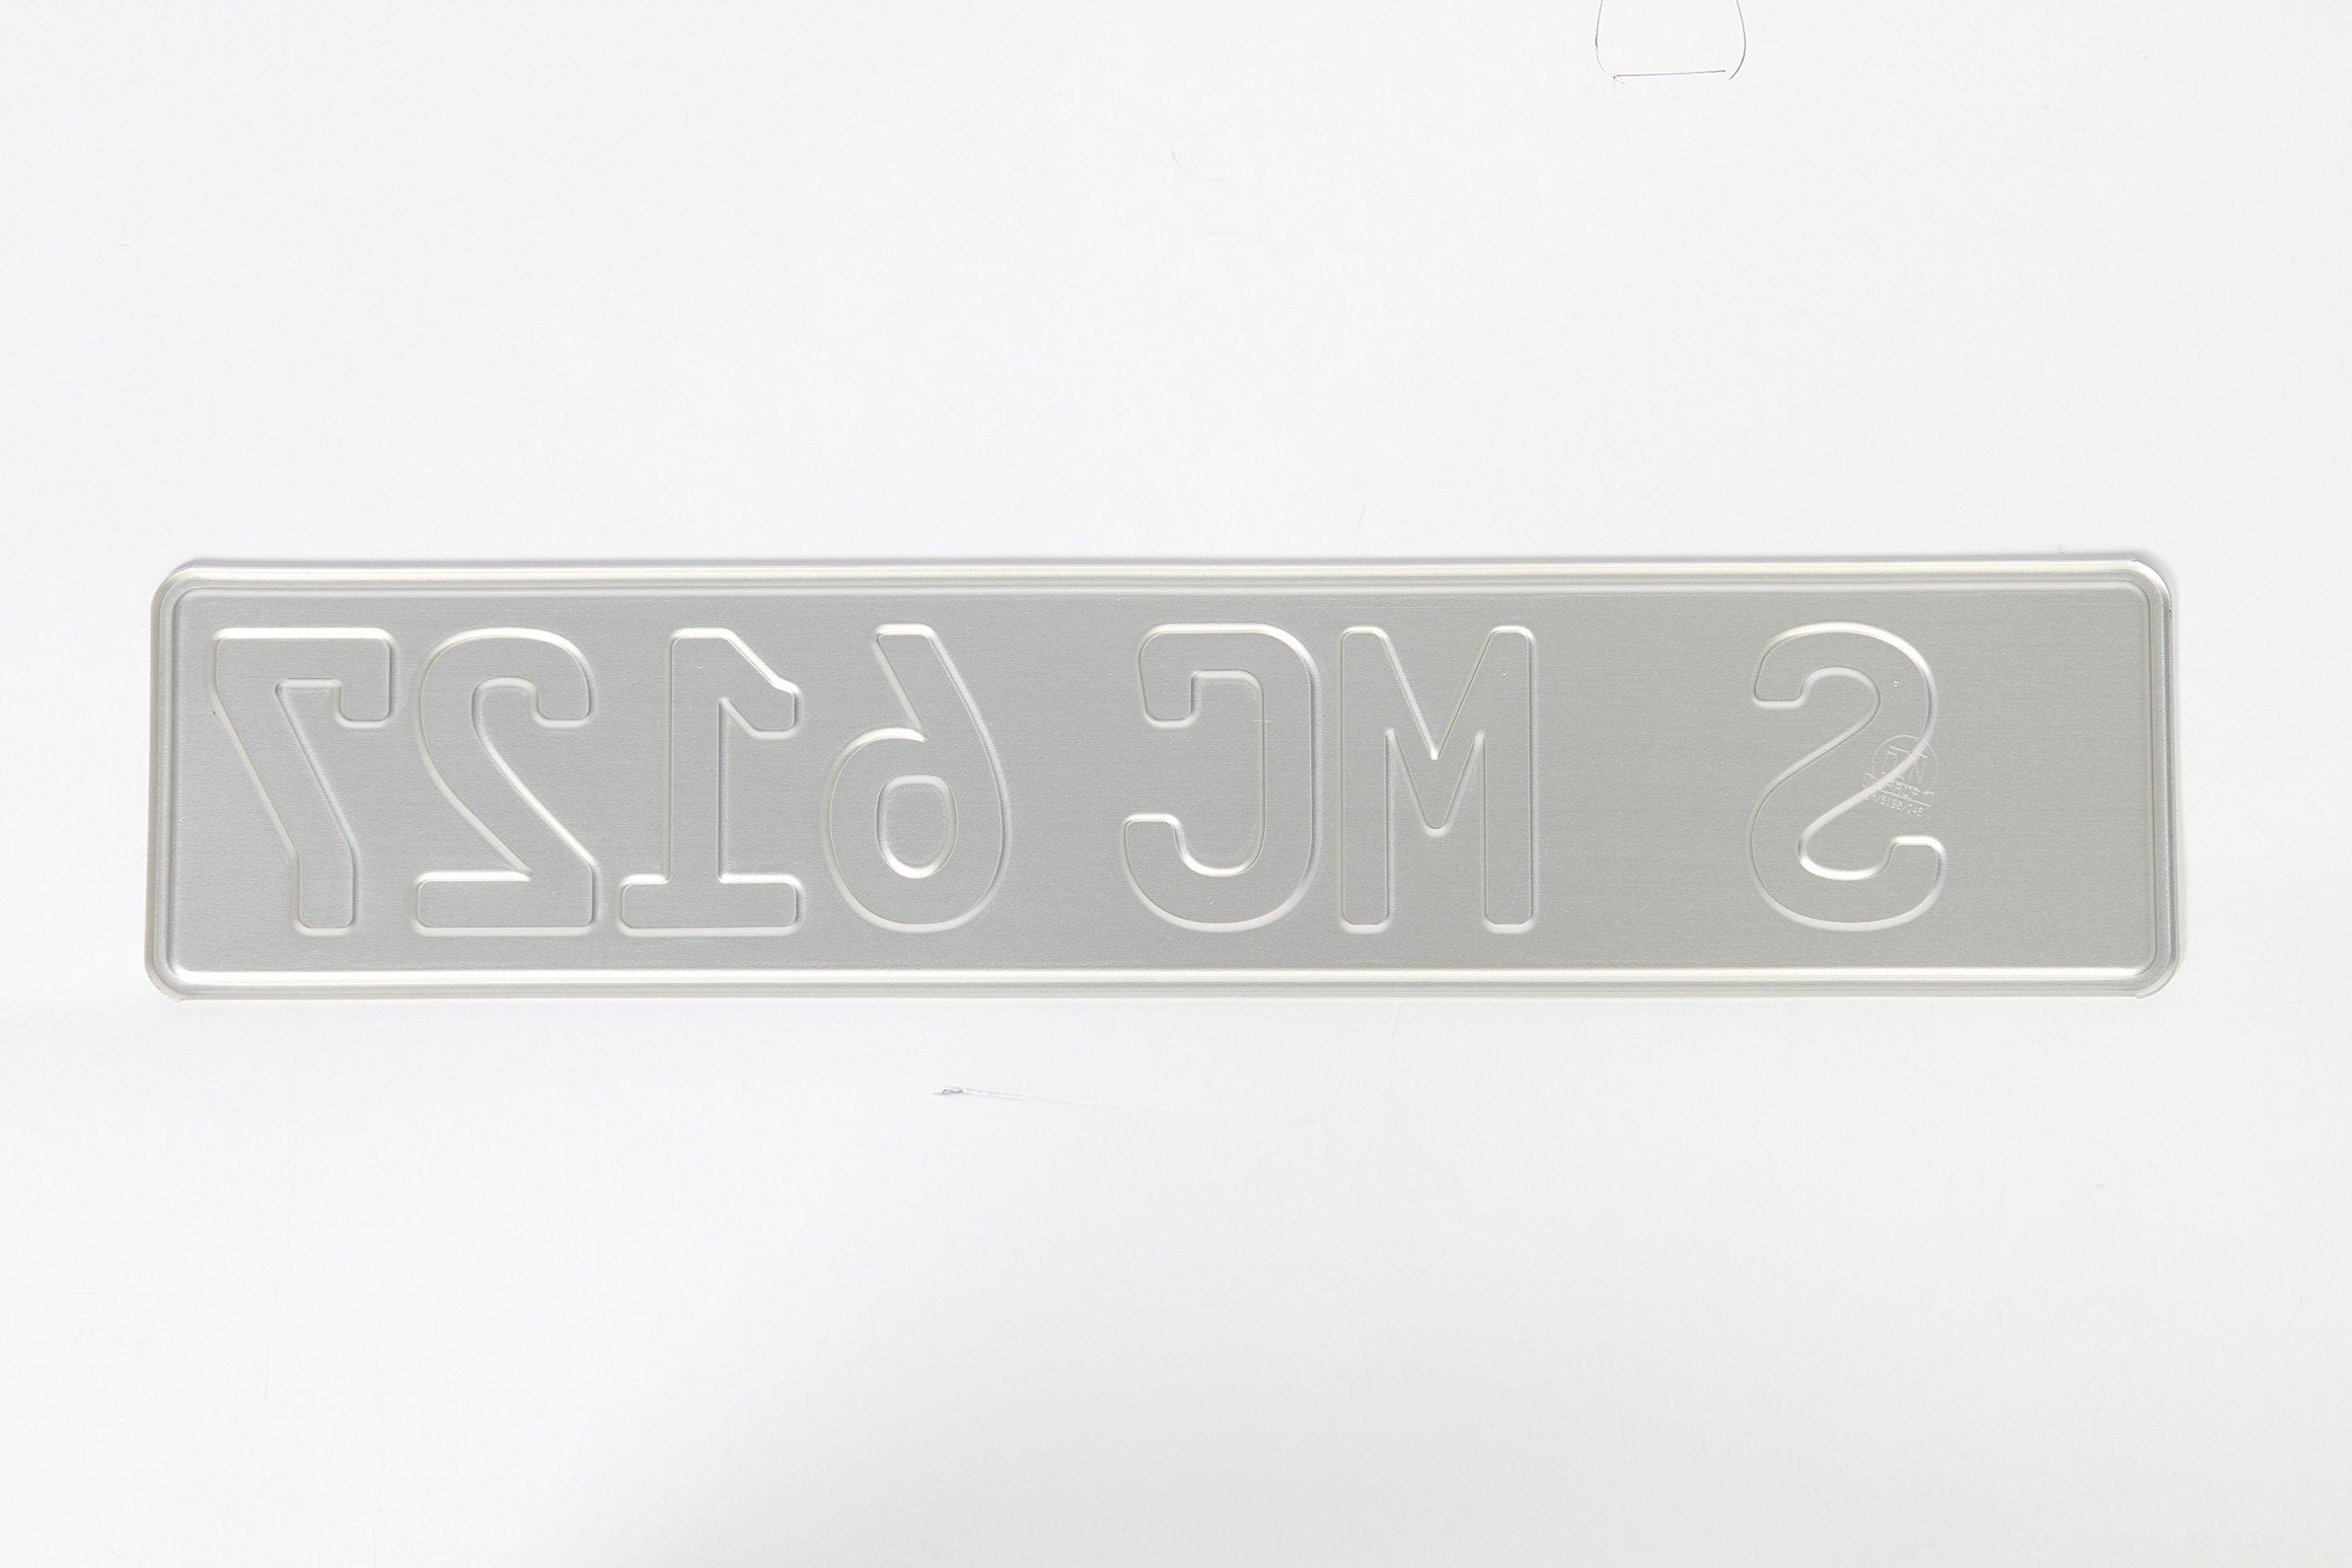 Custom German License Plate - Customizable - German EU or Coat of Arms Side Bar by European License Plates (Image #2)